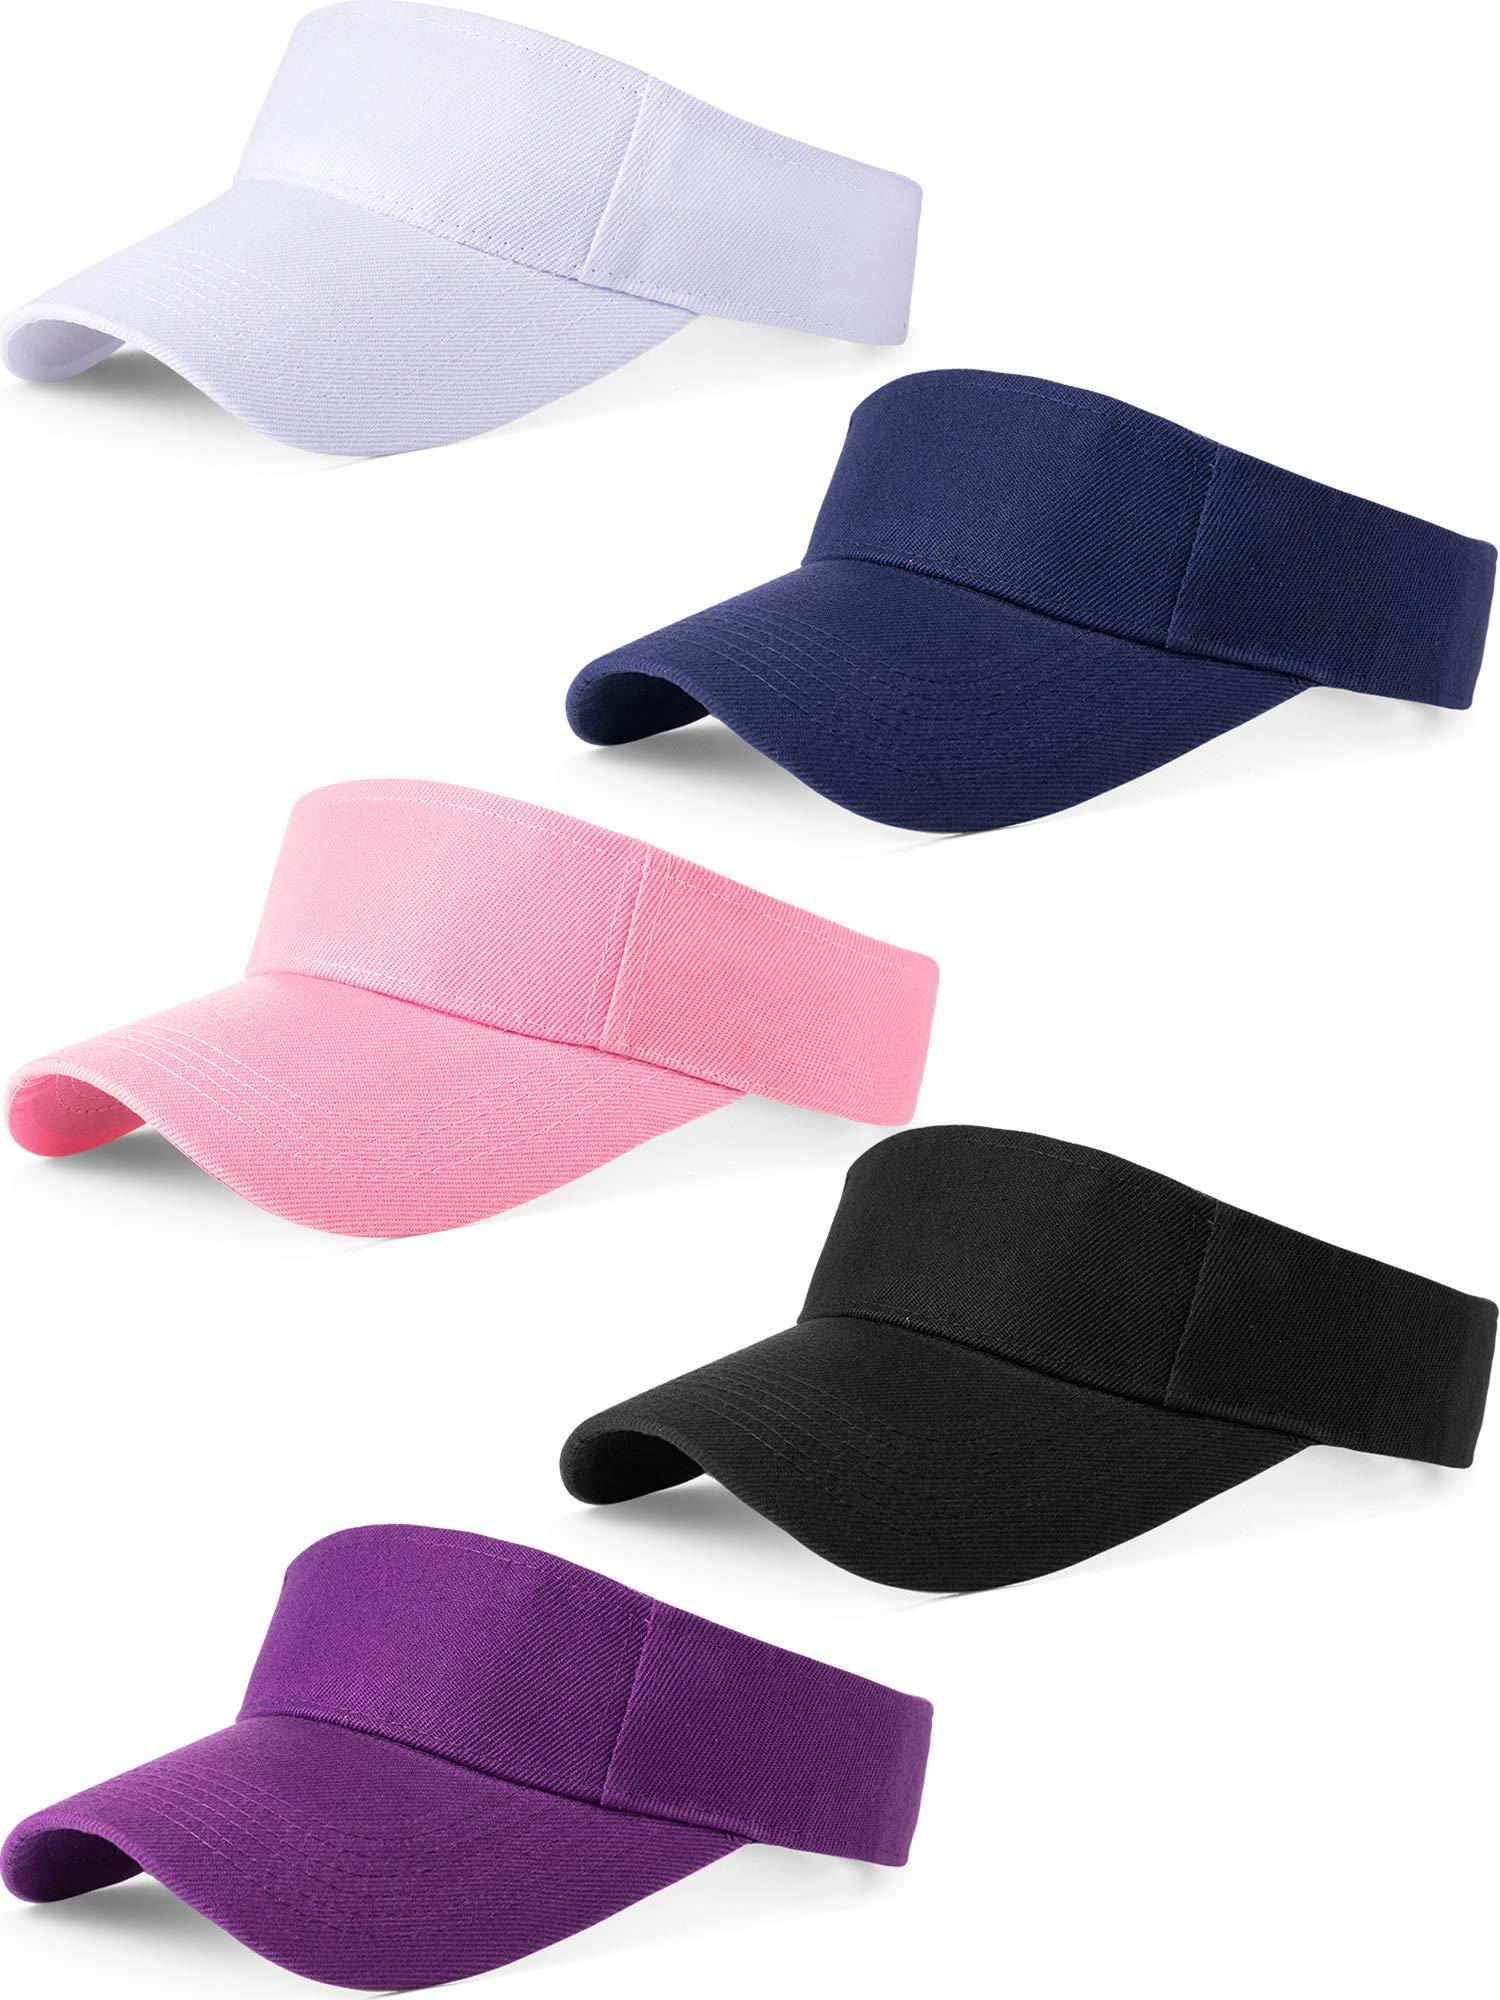 5 Pieces Sport Wear Athletic Visor Sun Visor Adjustable Cap Men Women Sun Sports Visor Hat (Navy Black White Pink Purple)